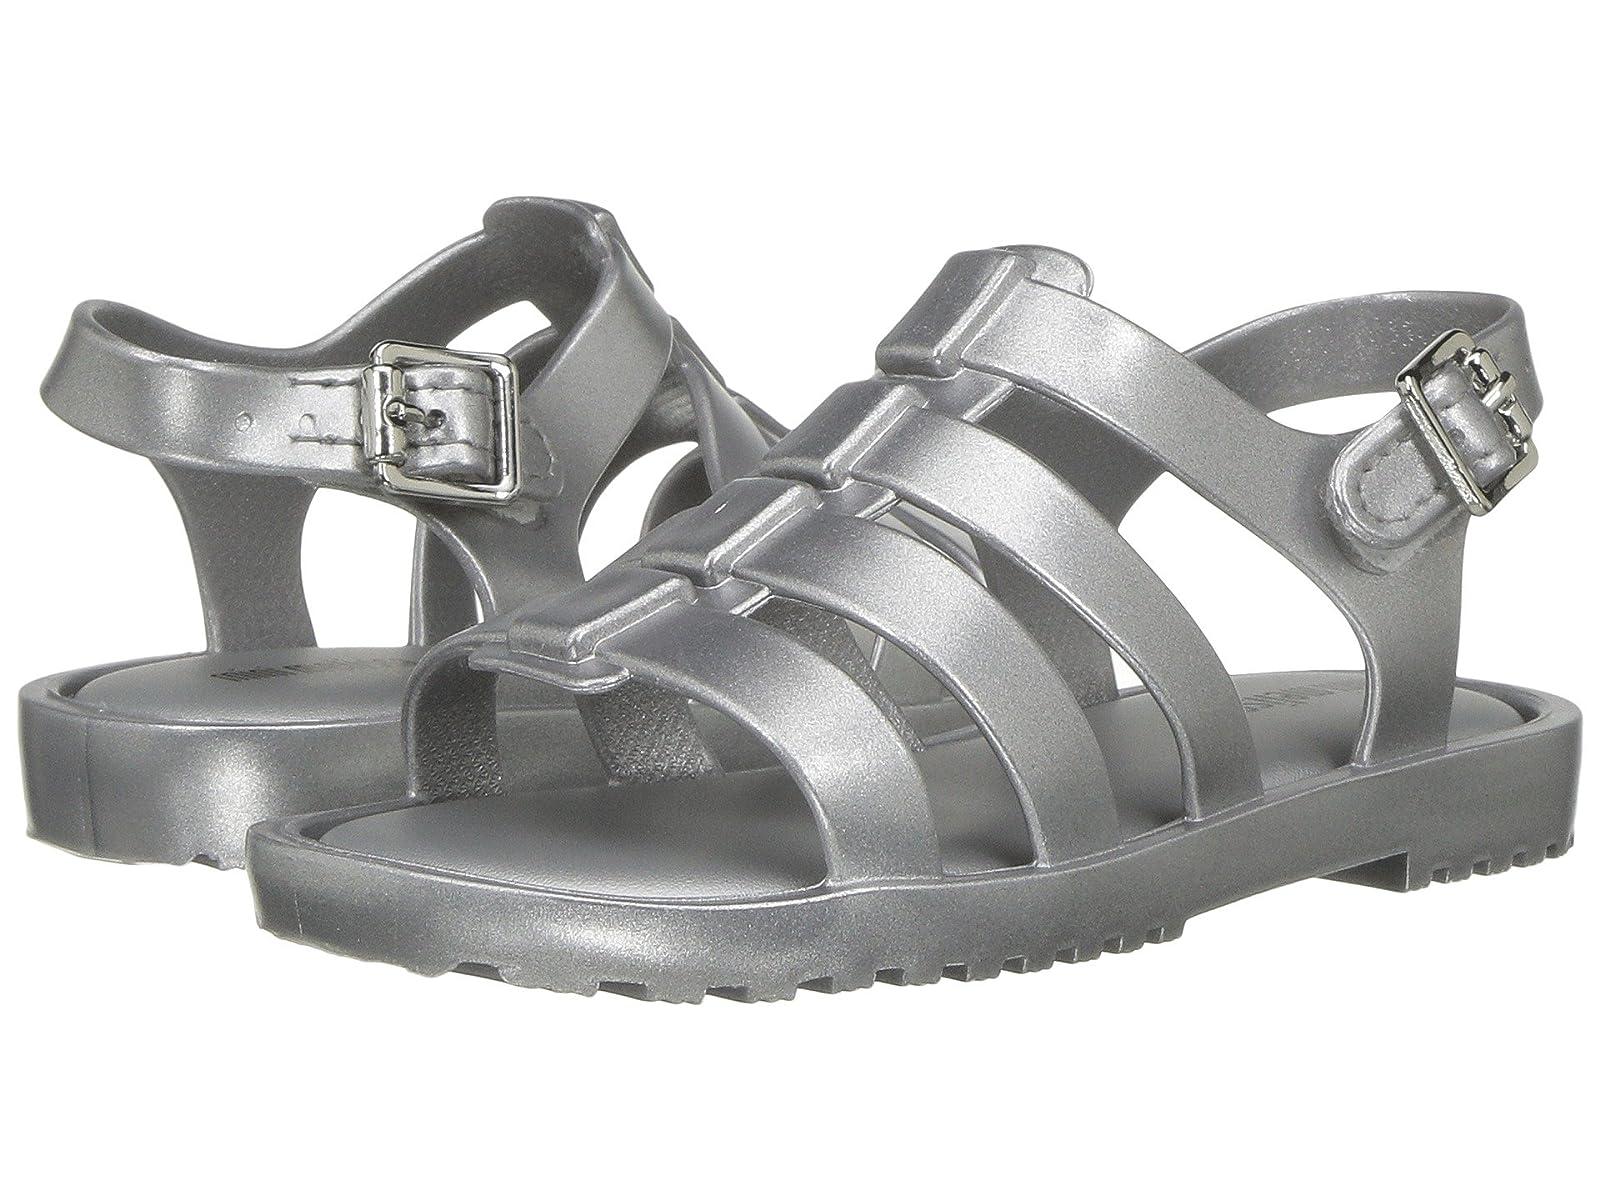 Mini Melissa Mini Flox Shine (Toddler)Cheap and distinctive eye-catching shoes